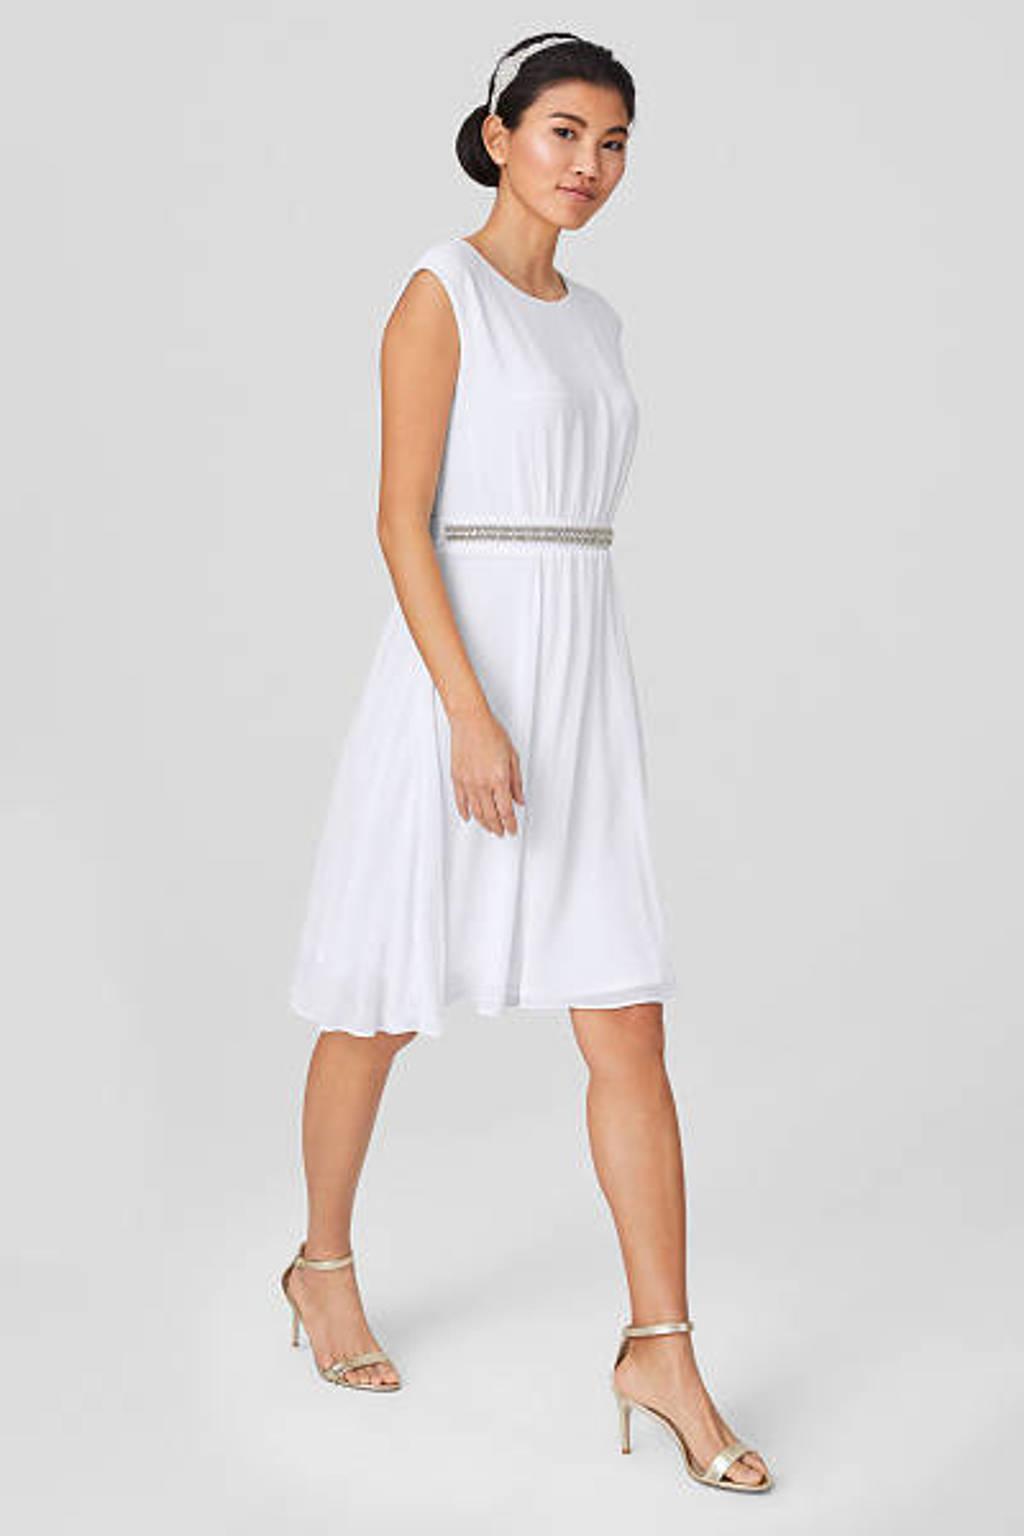 C&A Yessica jurk met strass steentjes ecru, Ecru